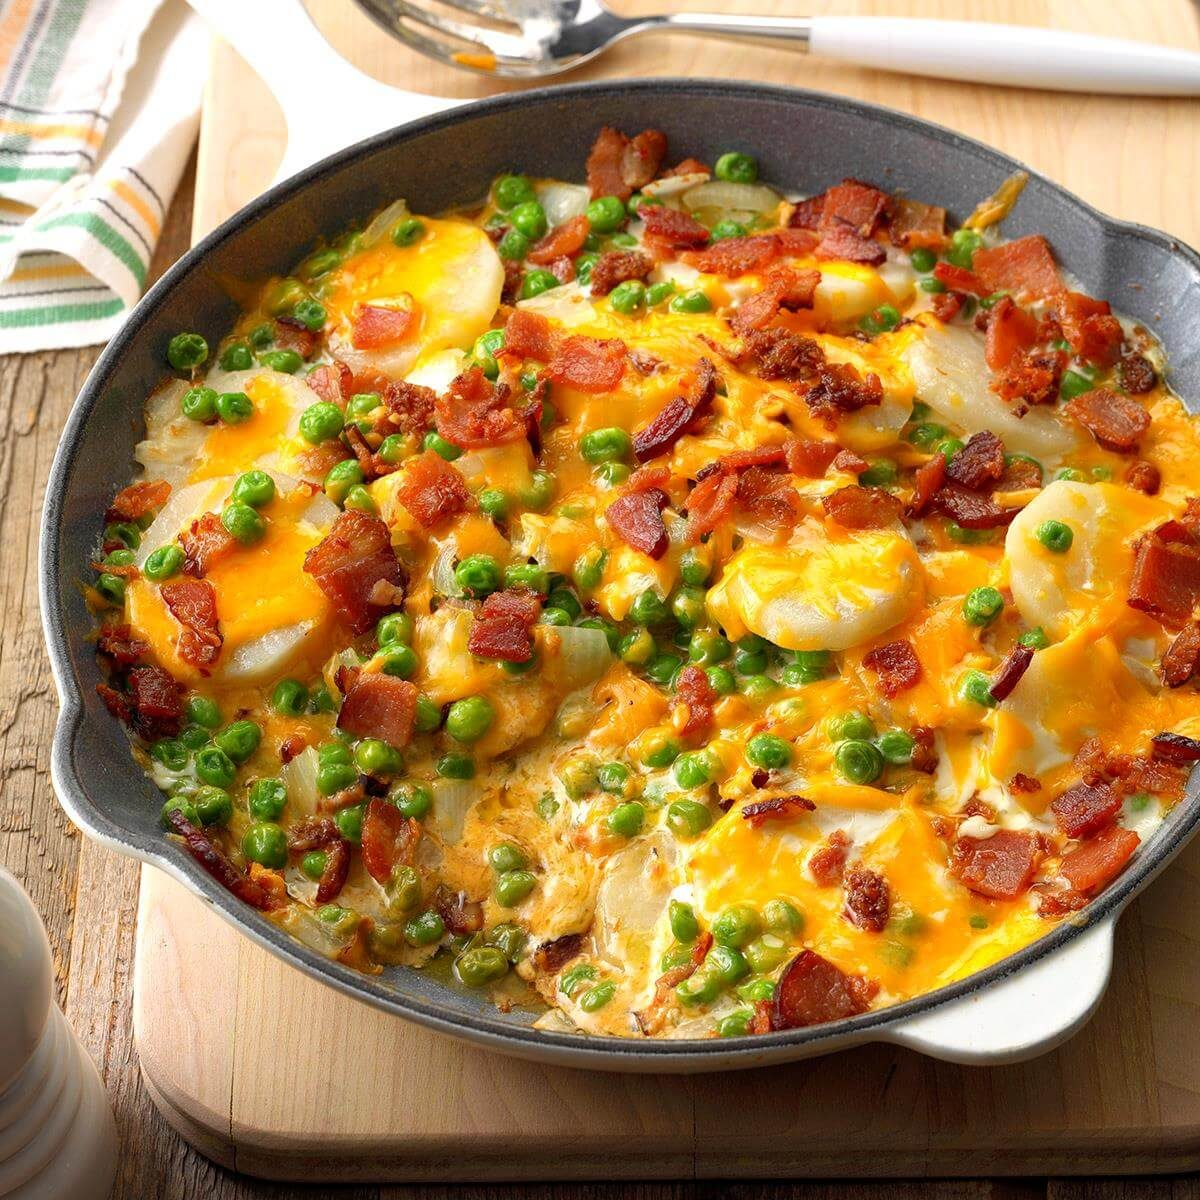 14 New Ways to Love Scalloped Potatoes